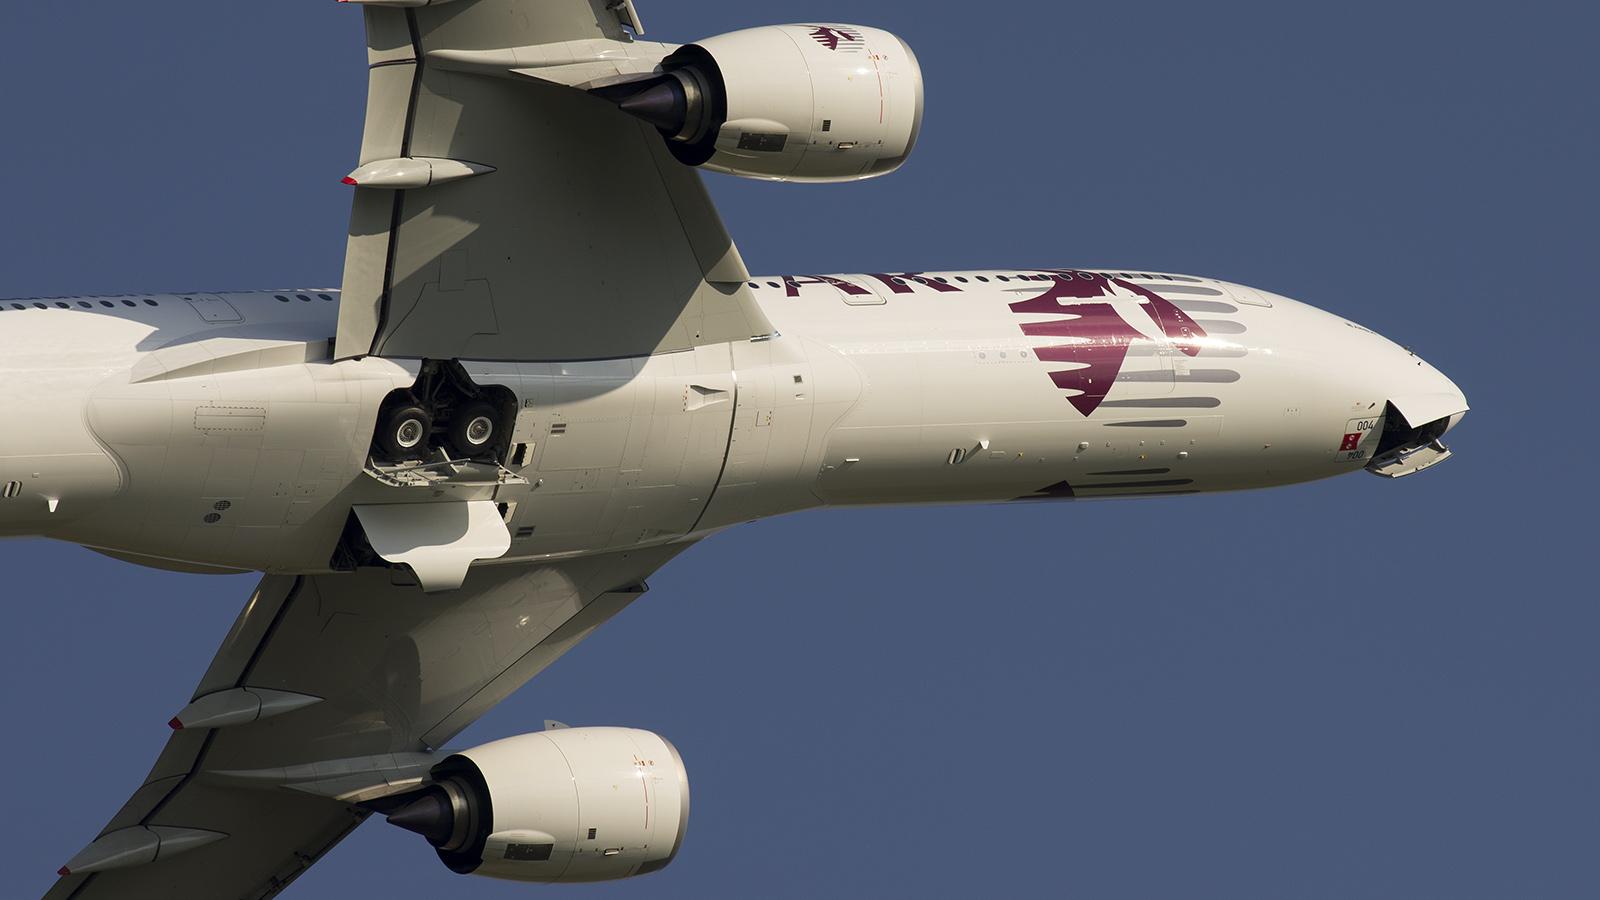 _IGP0772 Airbus A350XWB Airbus-Qatar colors F-WZNW